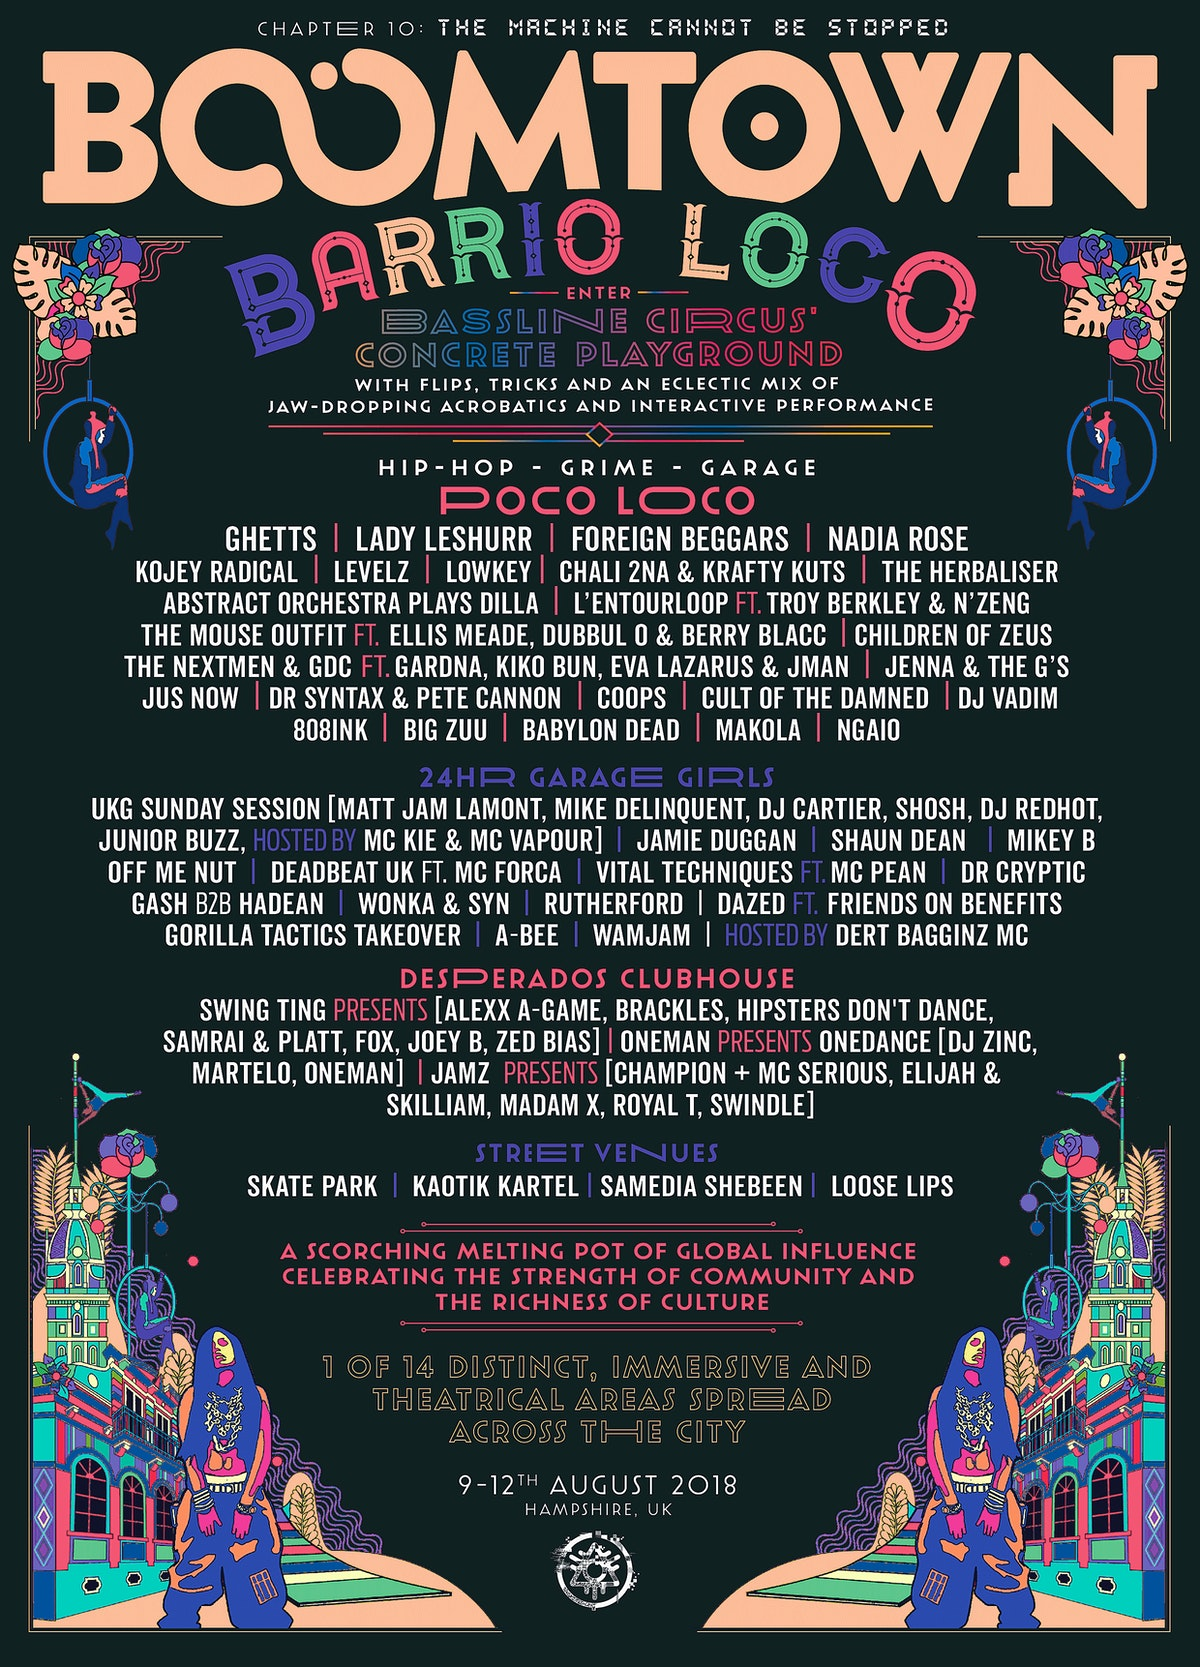 District Announcement: Barrio Loco